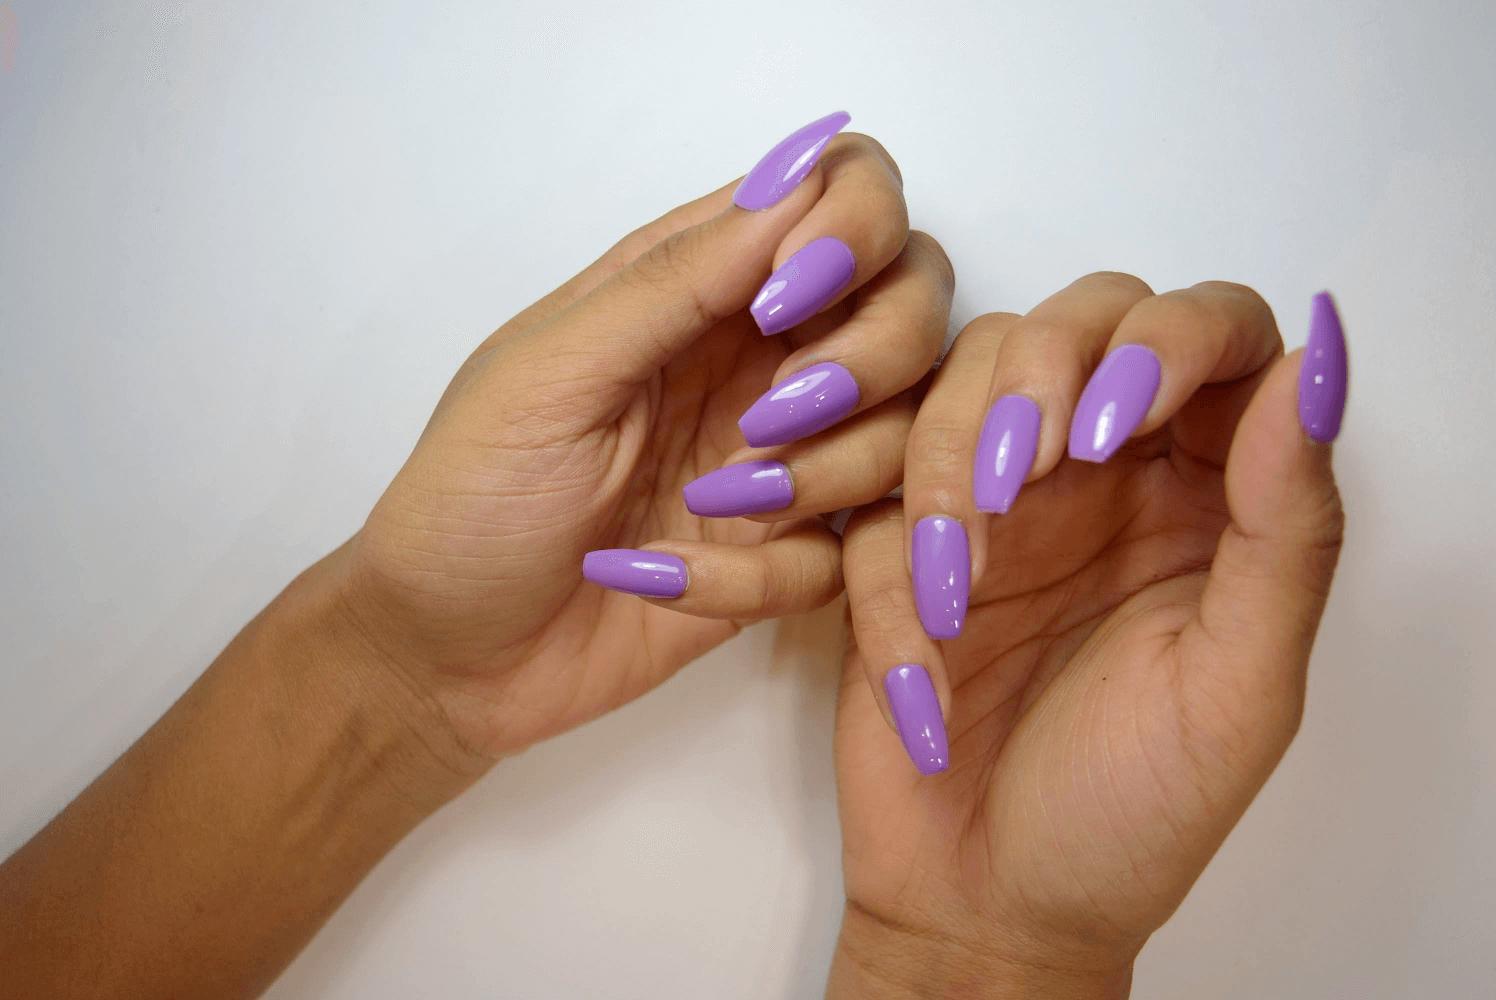 Corine Lastar Penetrates Nigeria With Unique Makeup Brushes Red Acrylic Nails Boho Nails Fall Acrylic Nails